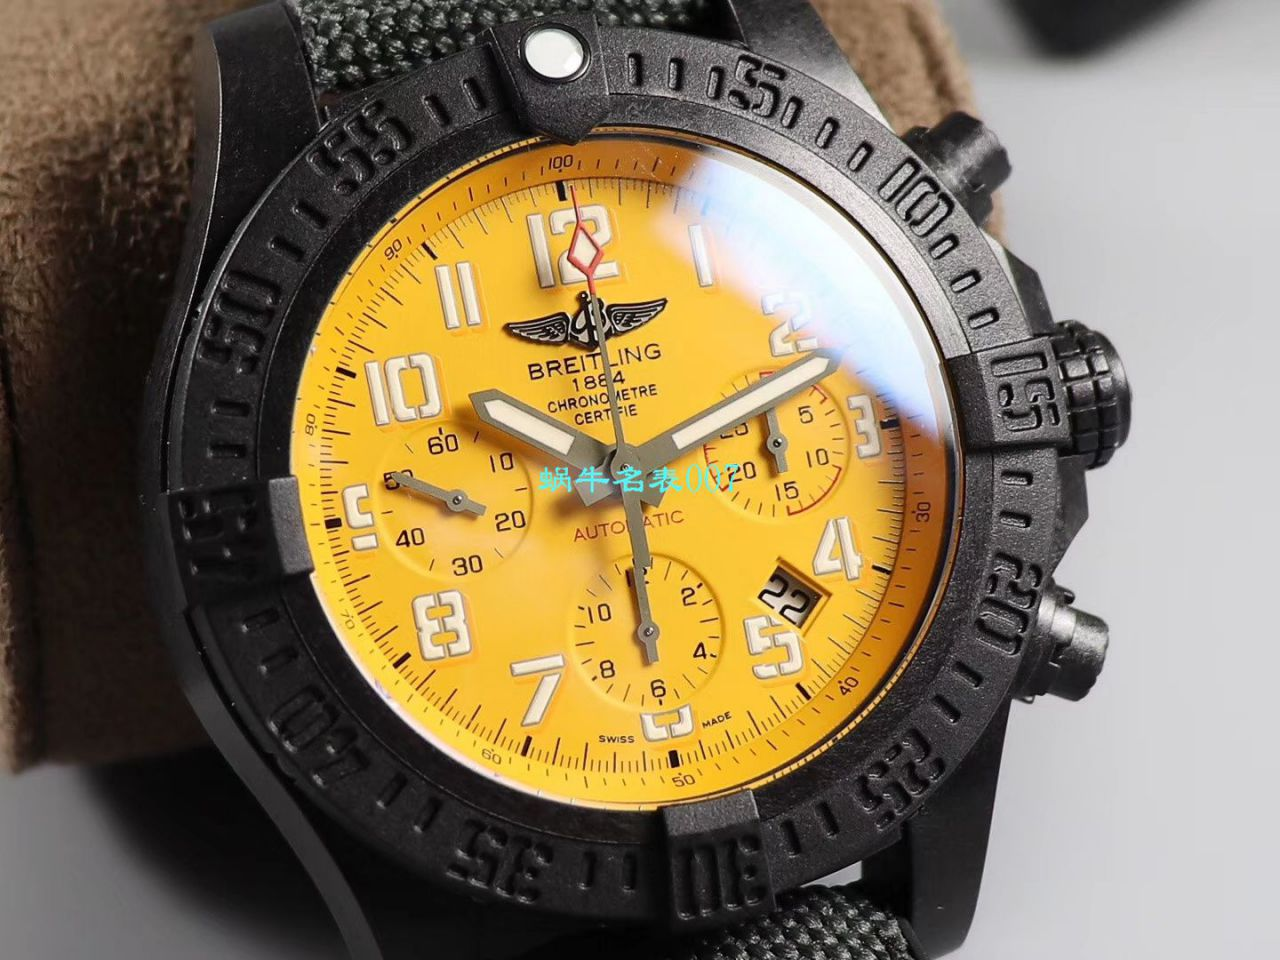 【GF厂官网复刻手表】百年灵复仇者飓风系列XB0180E4.BF31.284S.X20D.4腕表